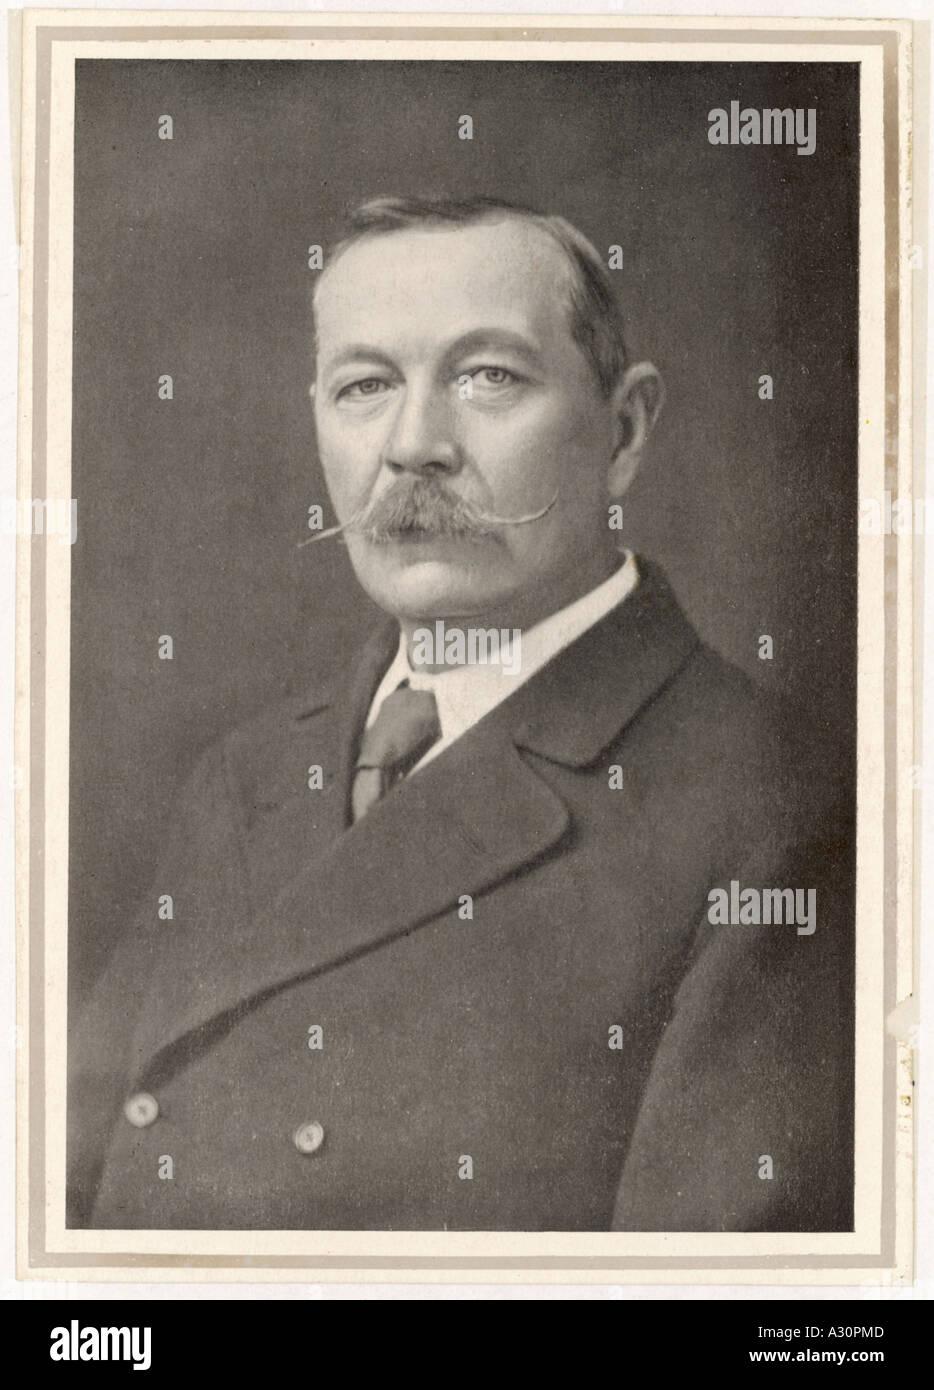 Conan Doyle Photo C 1908 - Stock Image